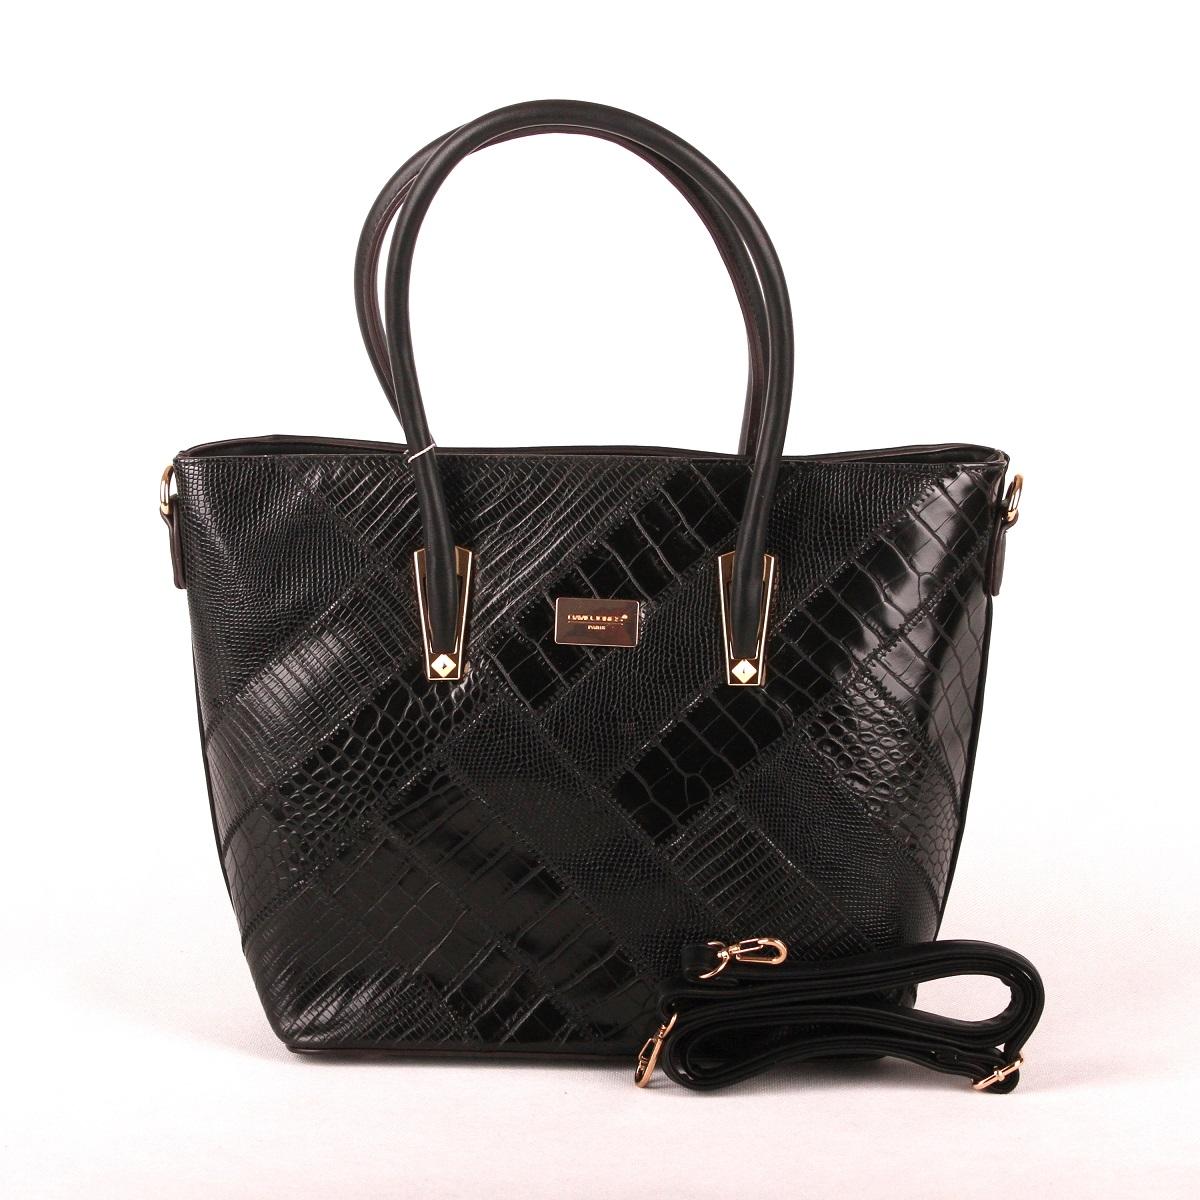 Černá kabelka do ruky David Jones 5206-5